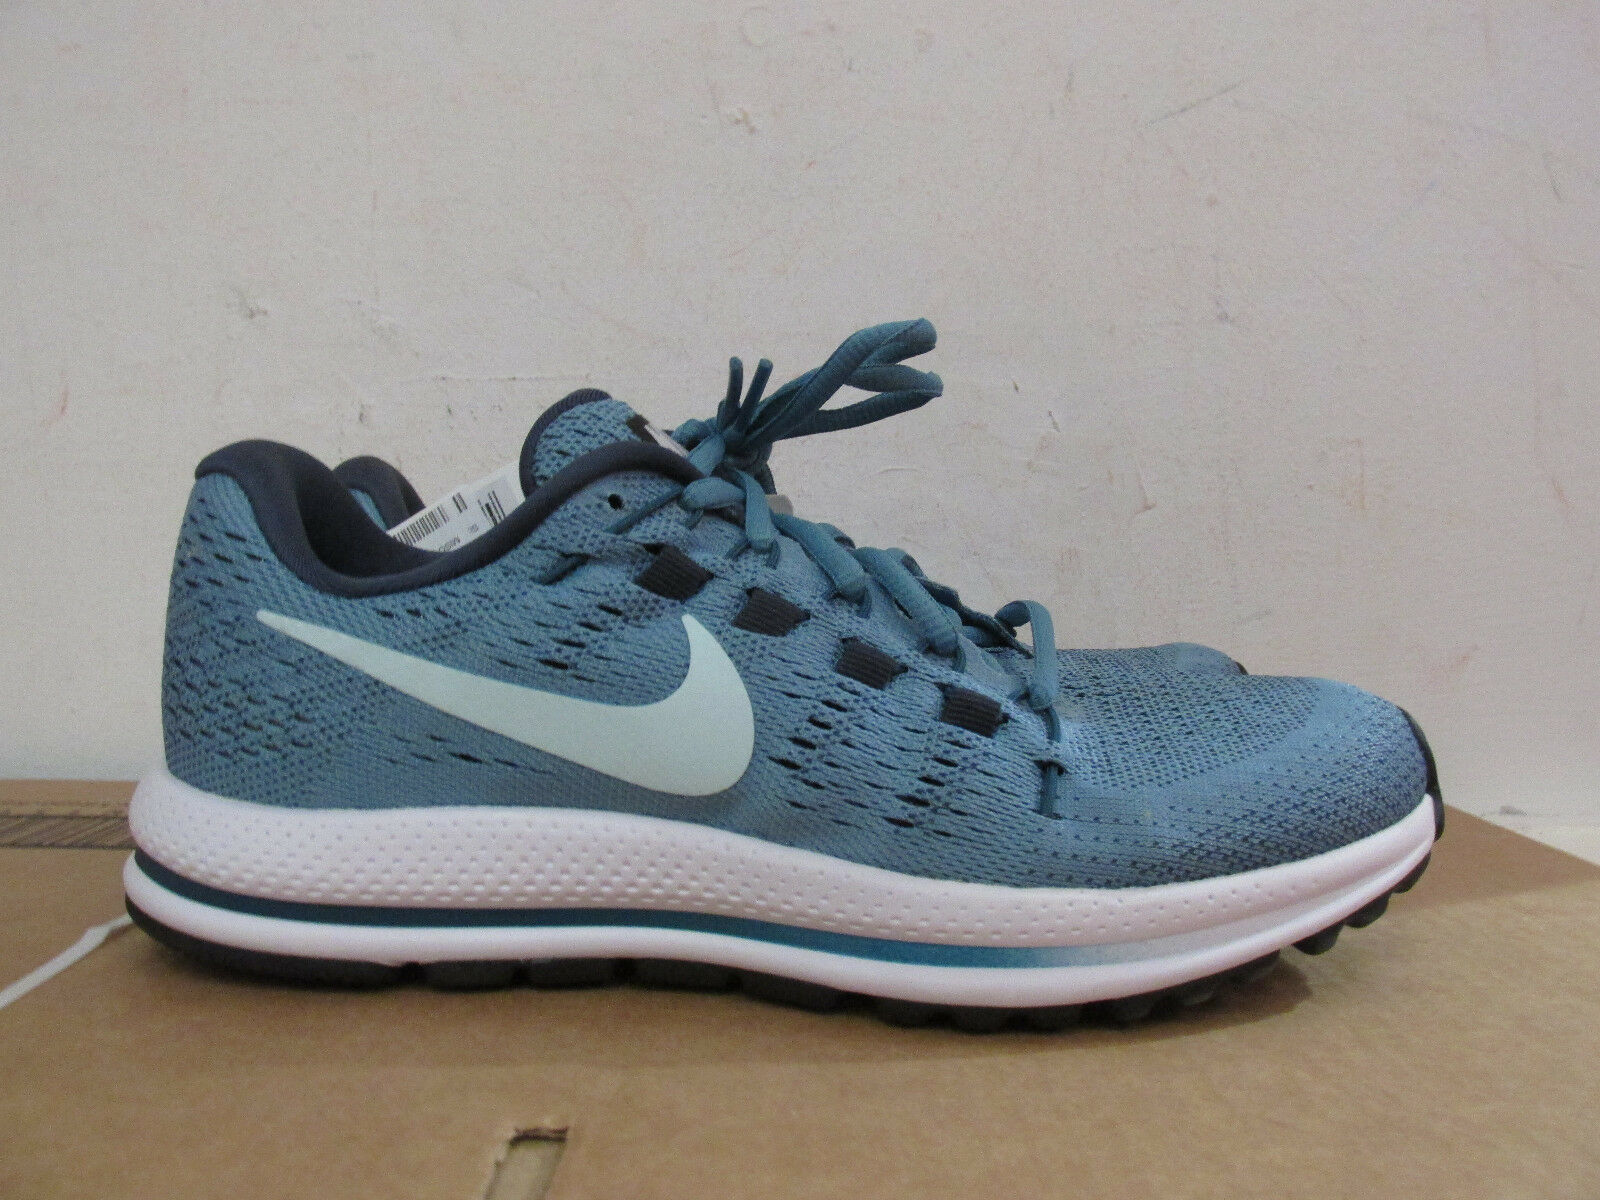 Nike Zoom Vomero 12 da Donna 403 Scarpe Ginnastica 863766 403 Donna Tennis Campione 371ca6